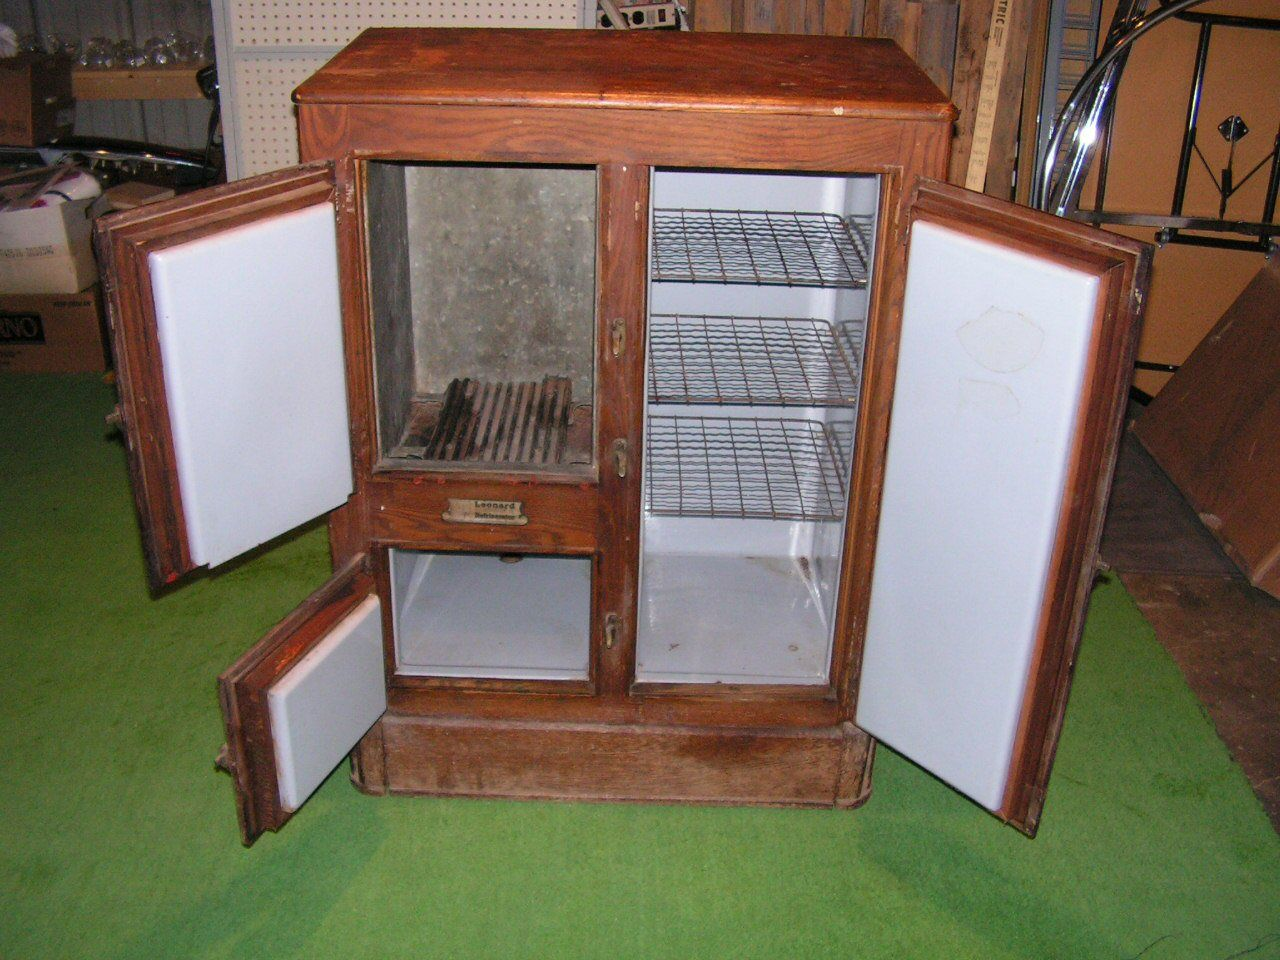 Antique Icebox Before Refrigerators In Olden Days